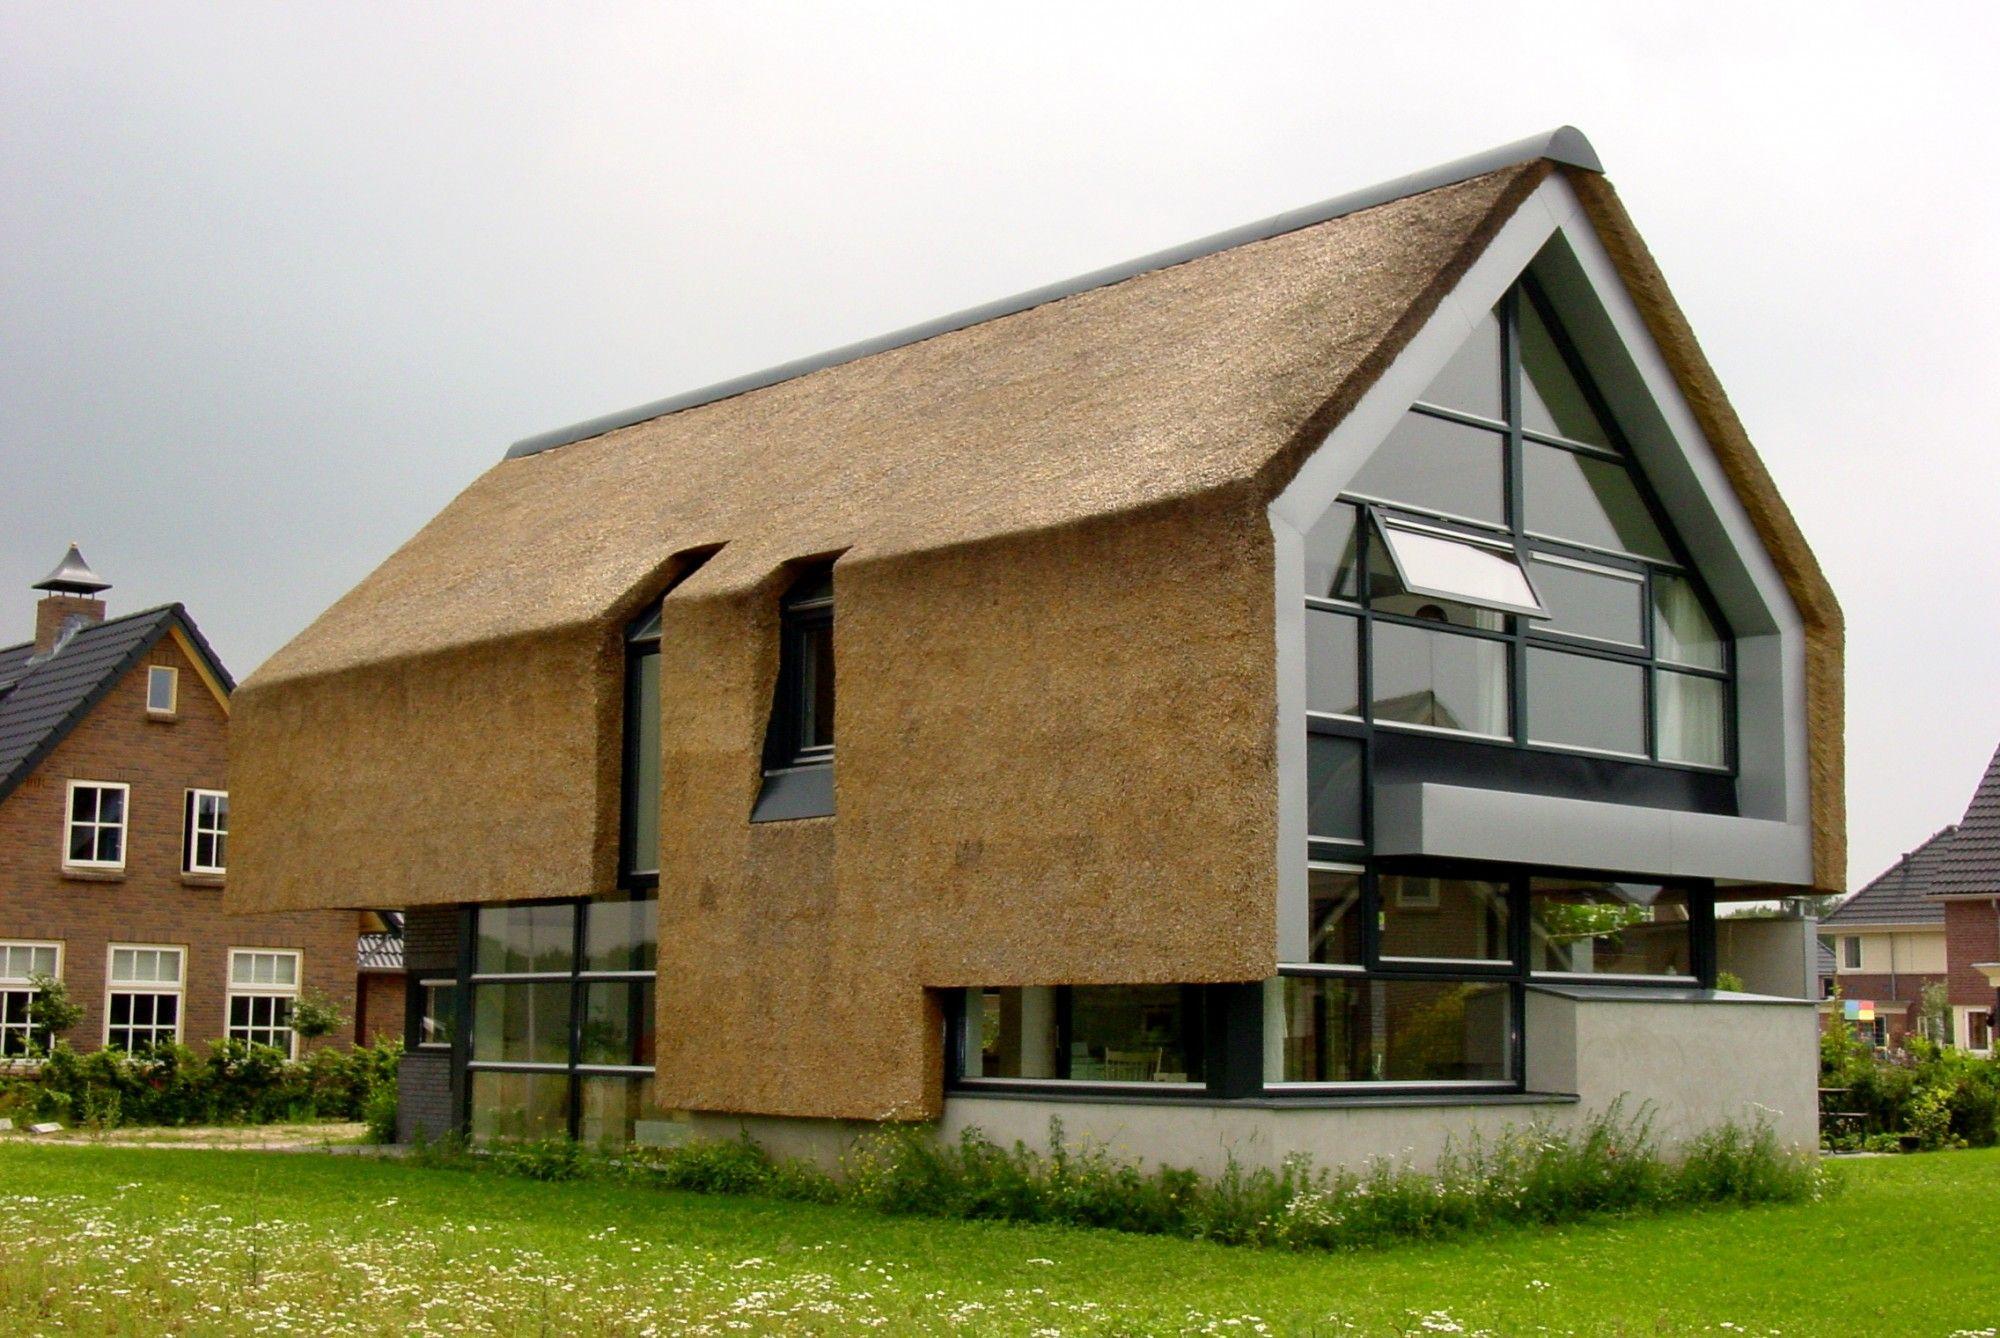 Rieten Dak Woning Modern House Thatched Roof H User